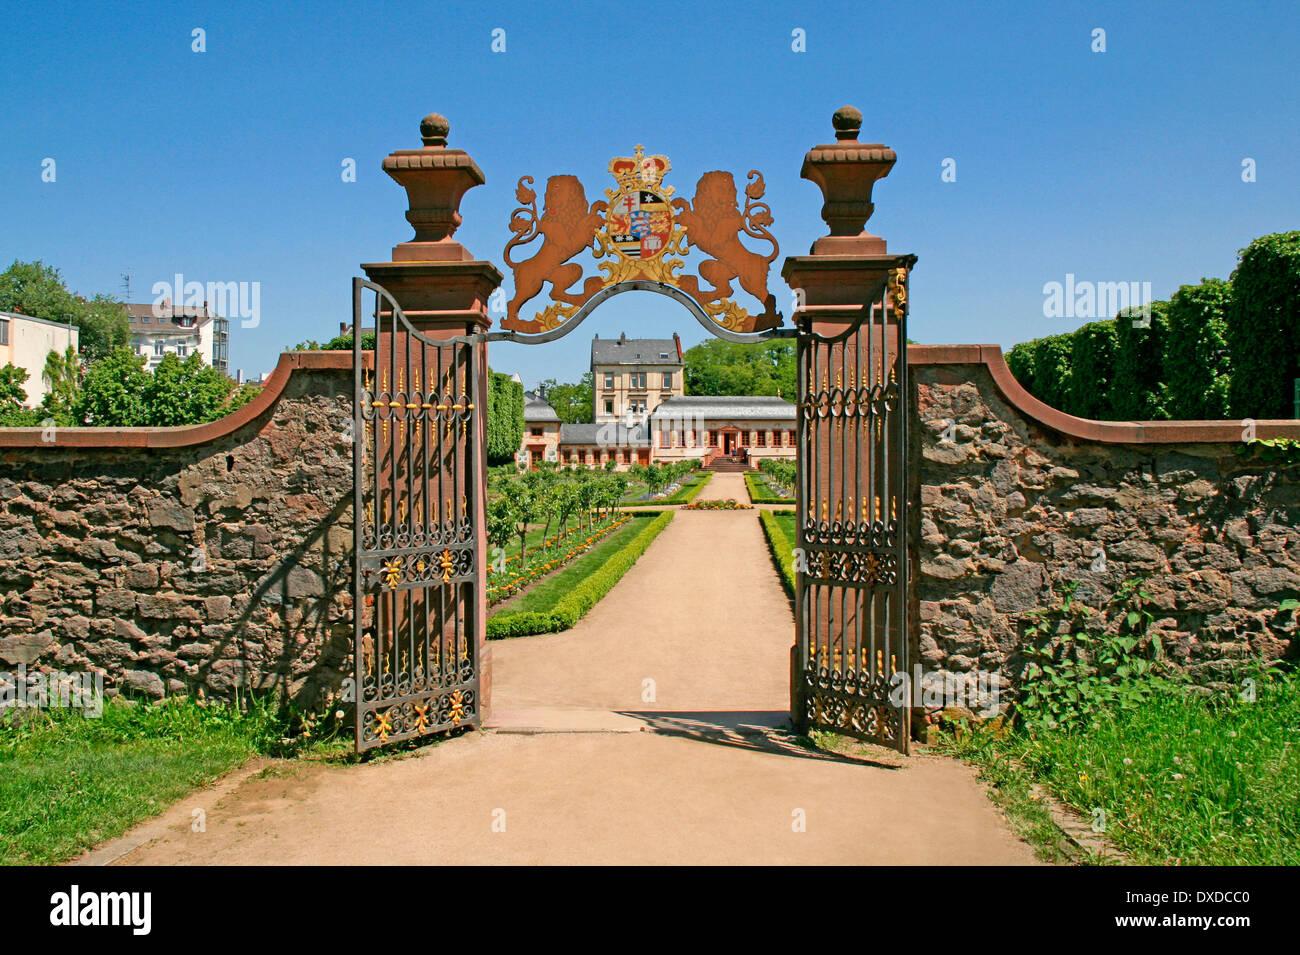 Prinz Georg Garten Darmstadt Stock Photo Royalty Free Image